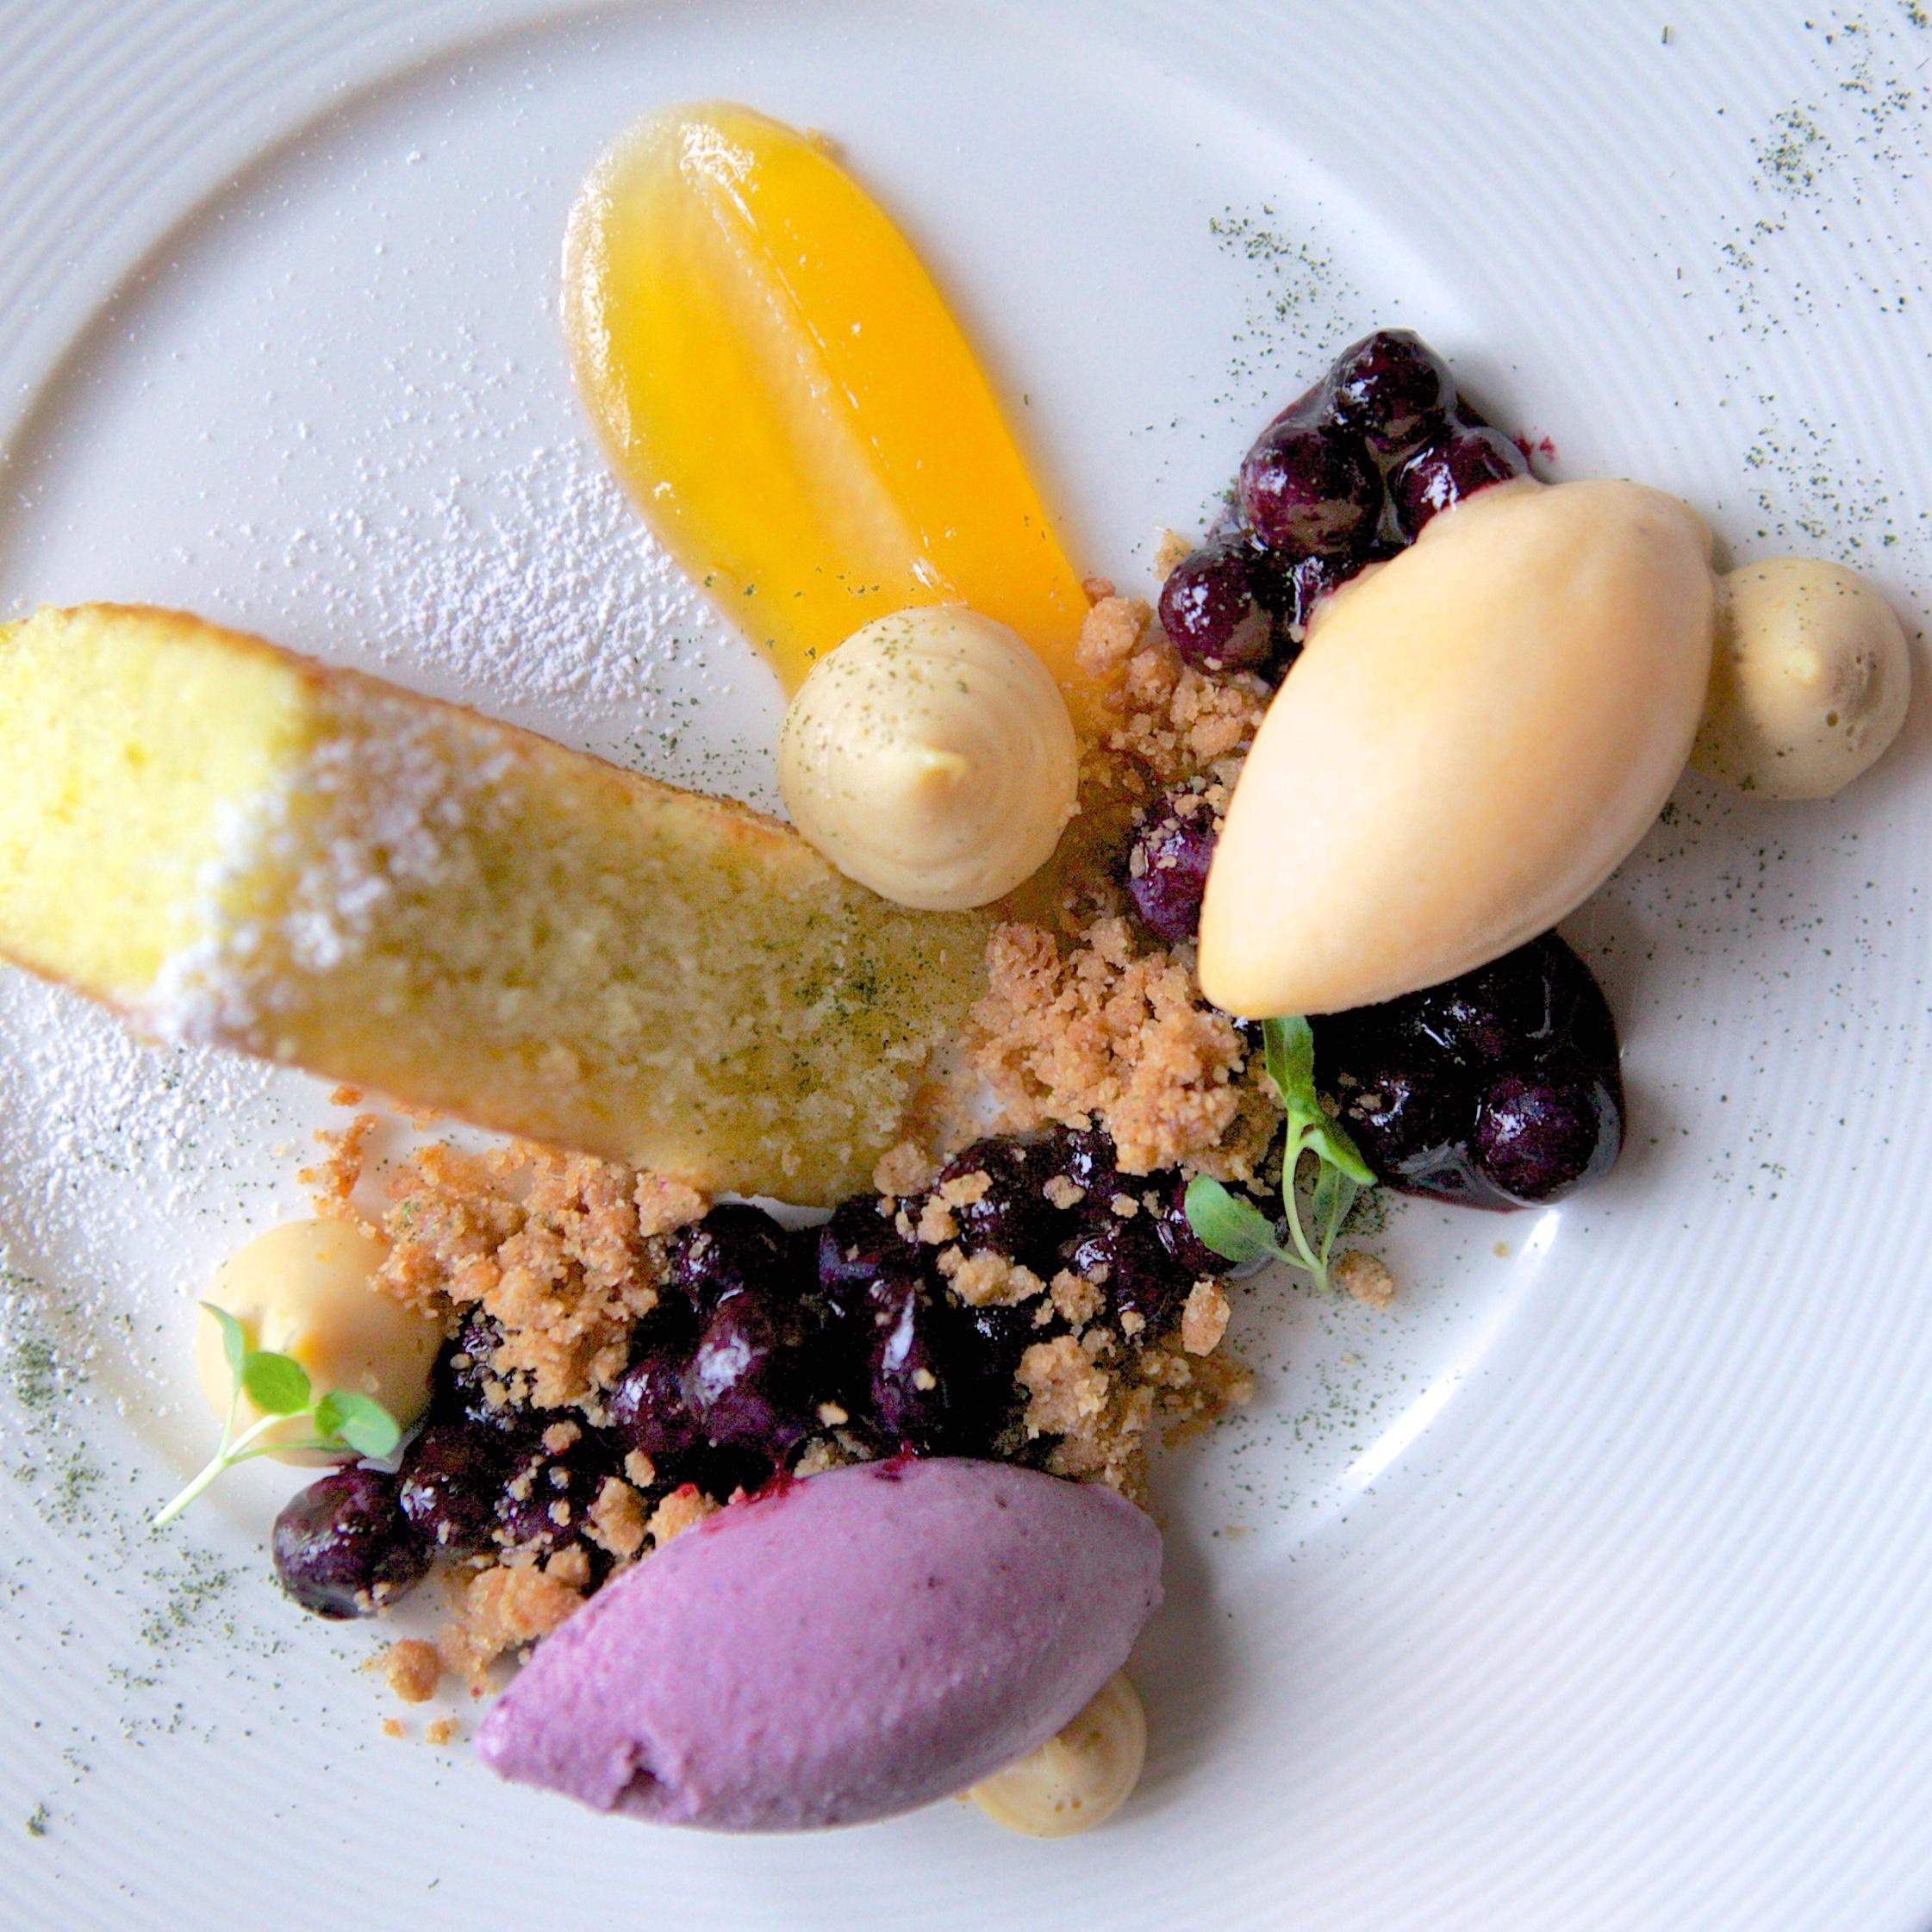 Above: Executive Pastry Chef Brian's never-ending amazing dessert creations! Lemon and vanilla bean poundcake, lemon verbena-blueberry sorbet, banana sorbet, fresh blueberry compote, shortbread crumble...